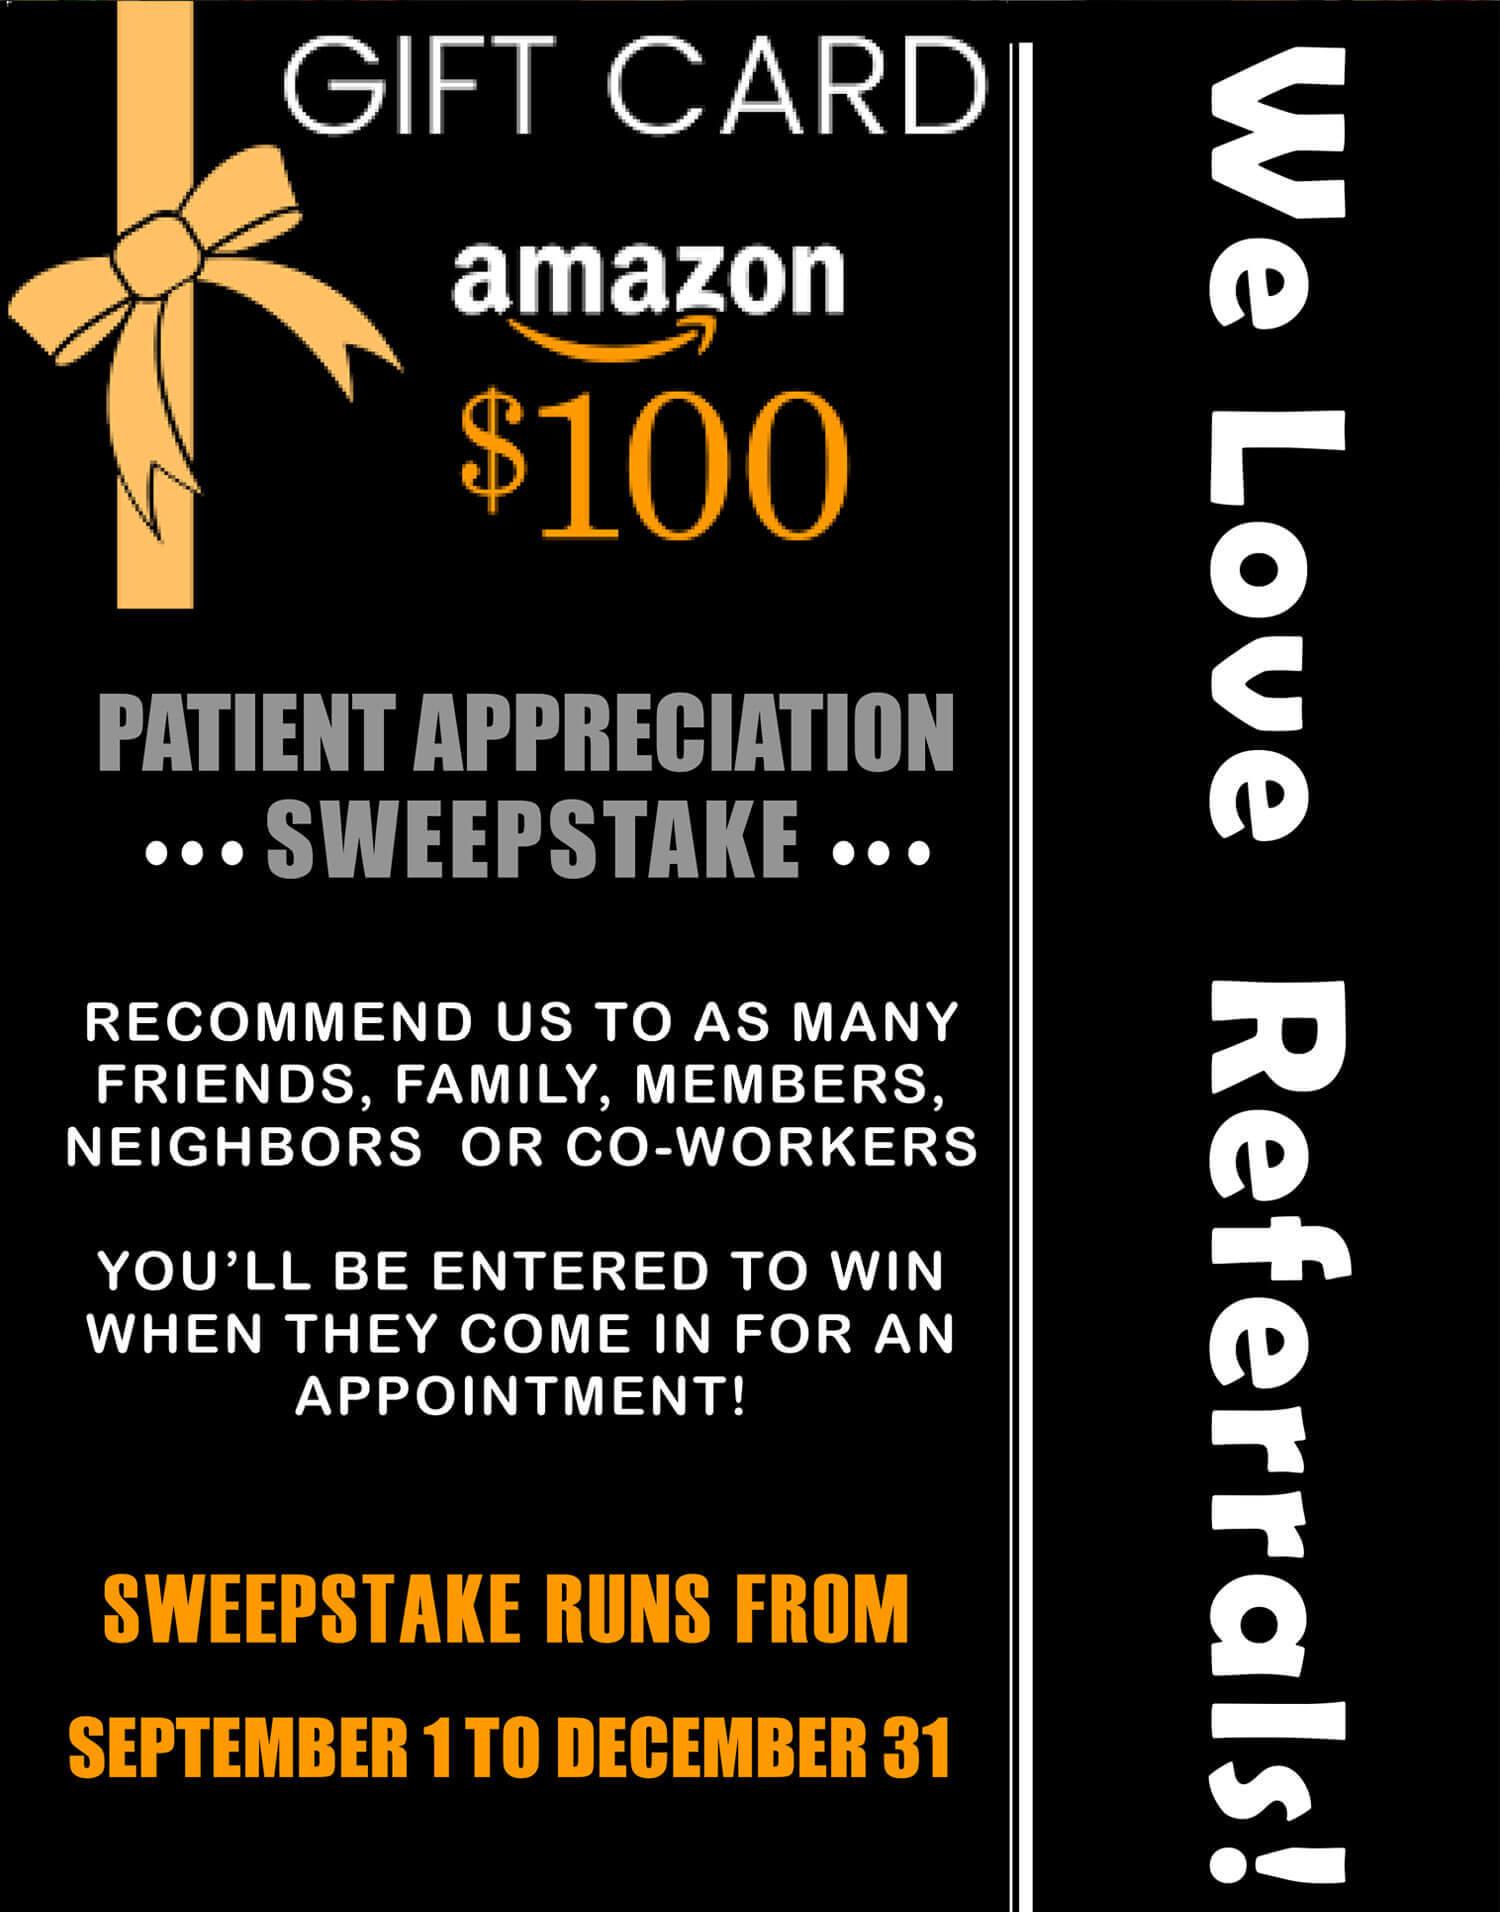 Amazon Gift Card Image